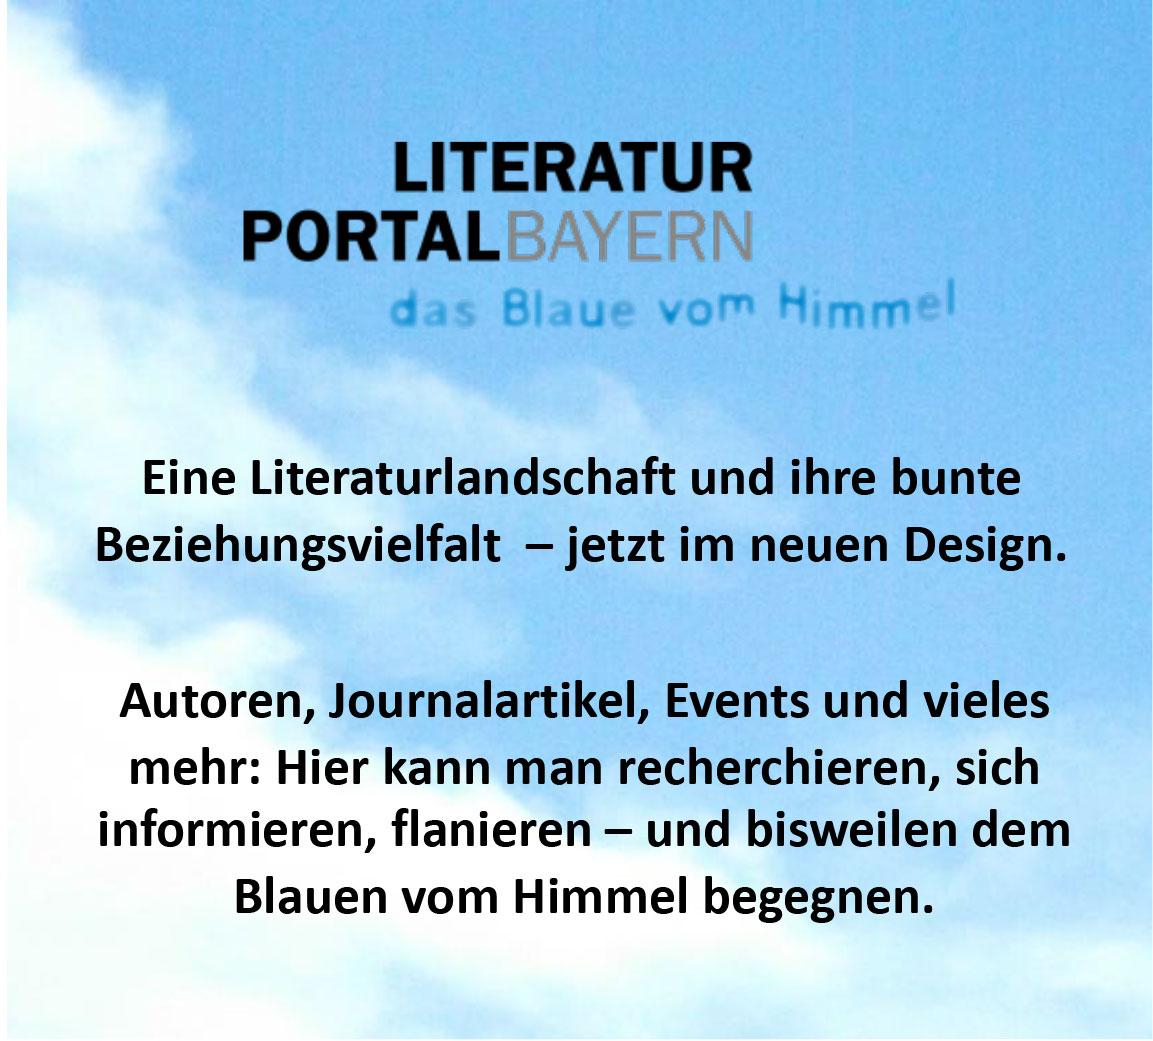 Literatur Portal Bayern